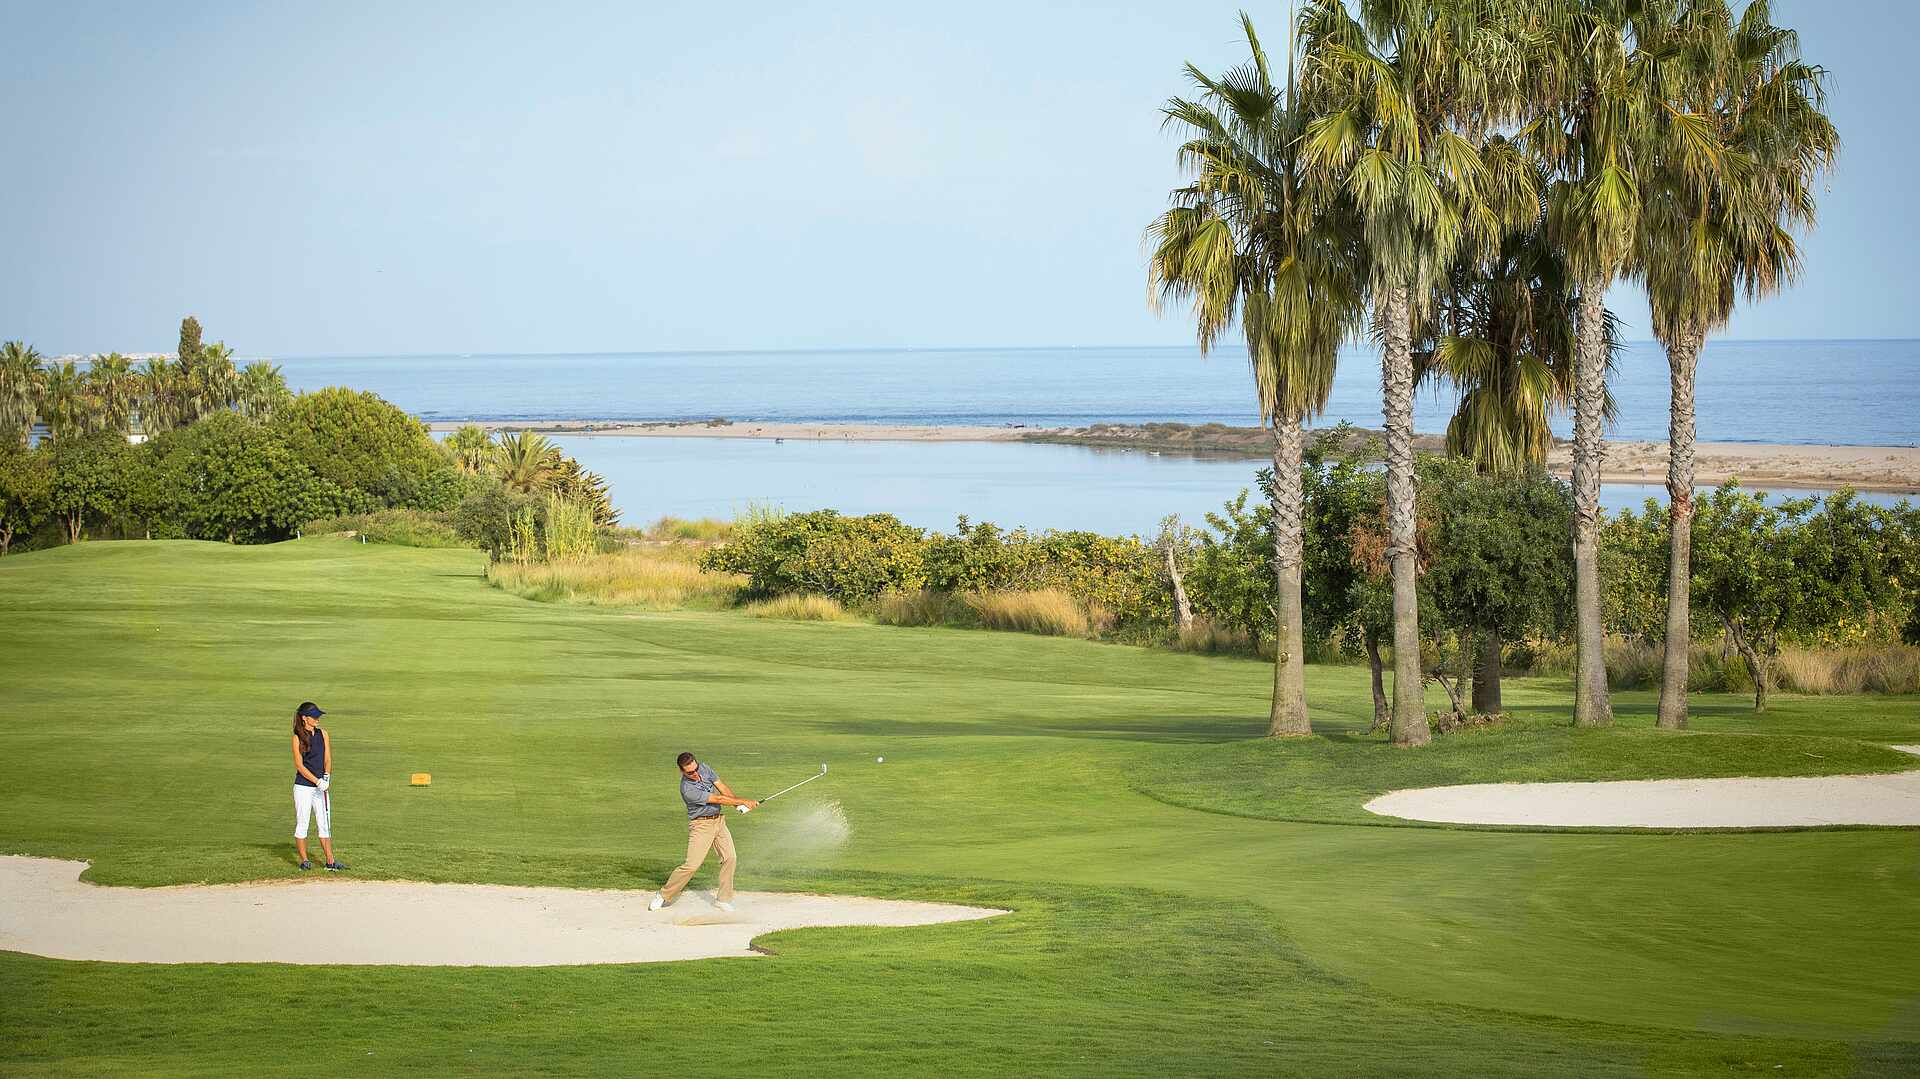 Golfparadies Andalusien - Costa del Sol und Hinterland